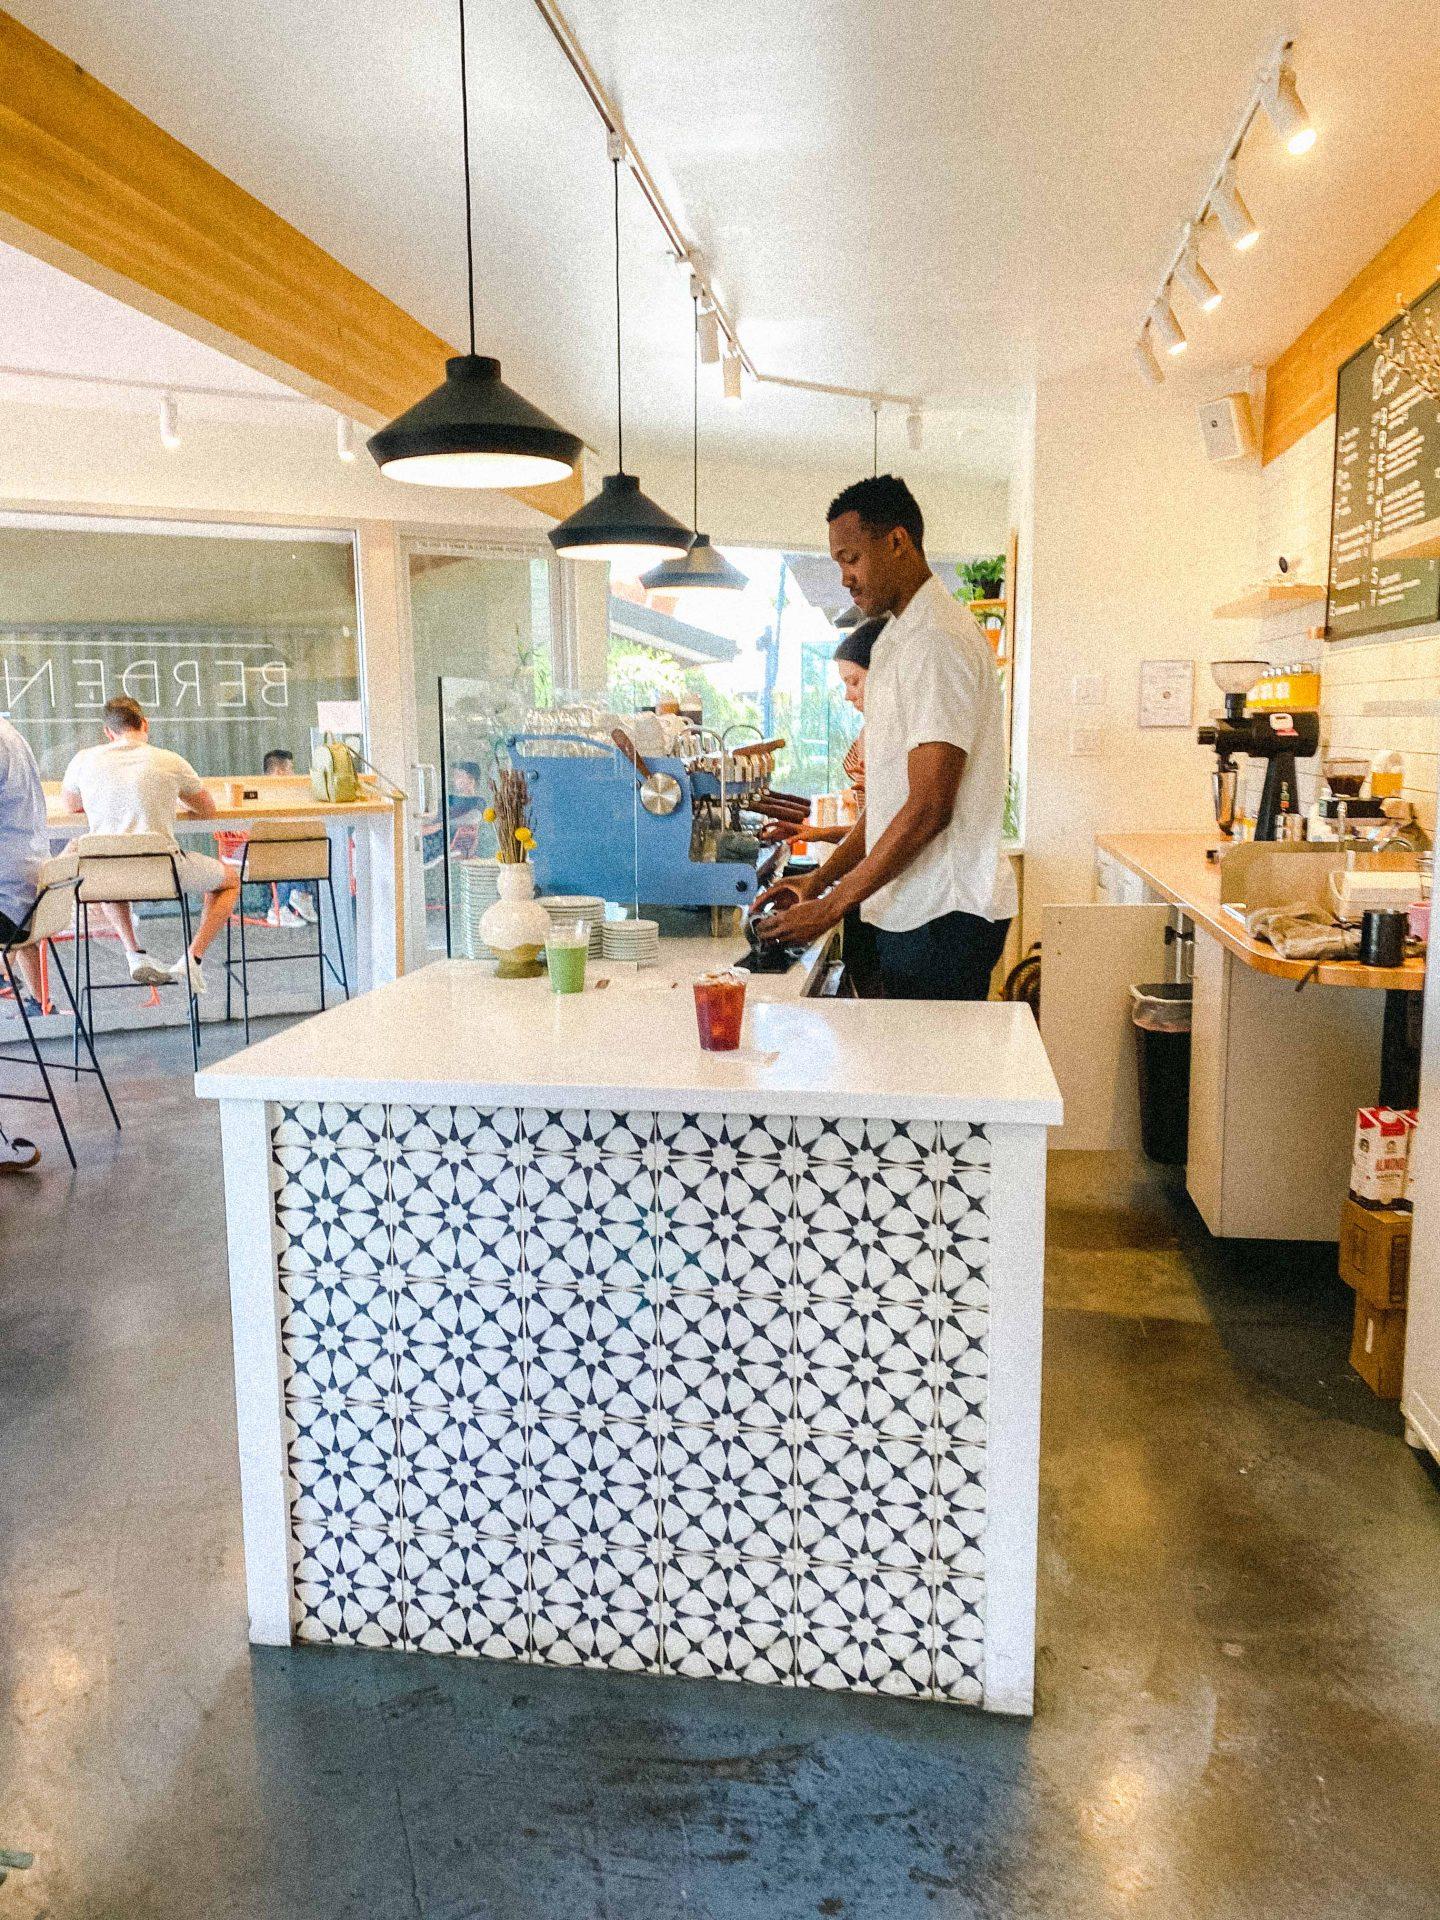 Best coffee shops in Scottsdale Arizona, Berdenas, Ultimate guide to scottsdale Arizona, travel blog, scottsdale travel, blogger, what to eat in scottsdale, what to do in scottsdale, coffee shop vibes, honeymoon